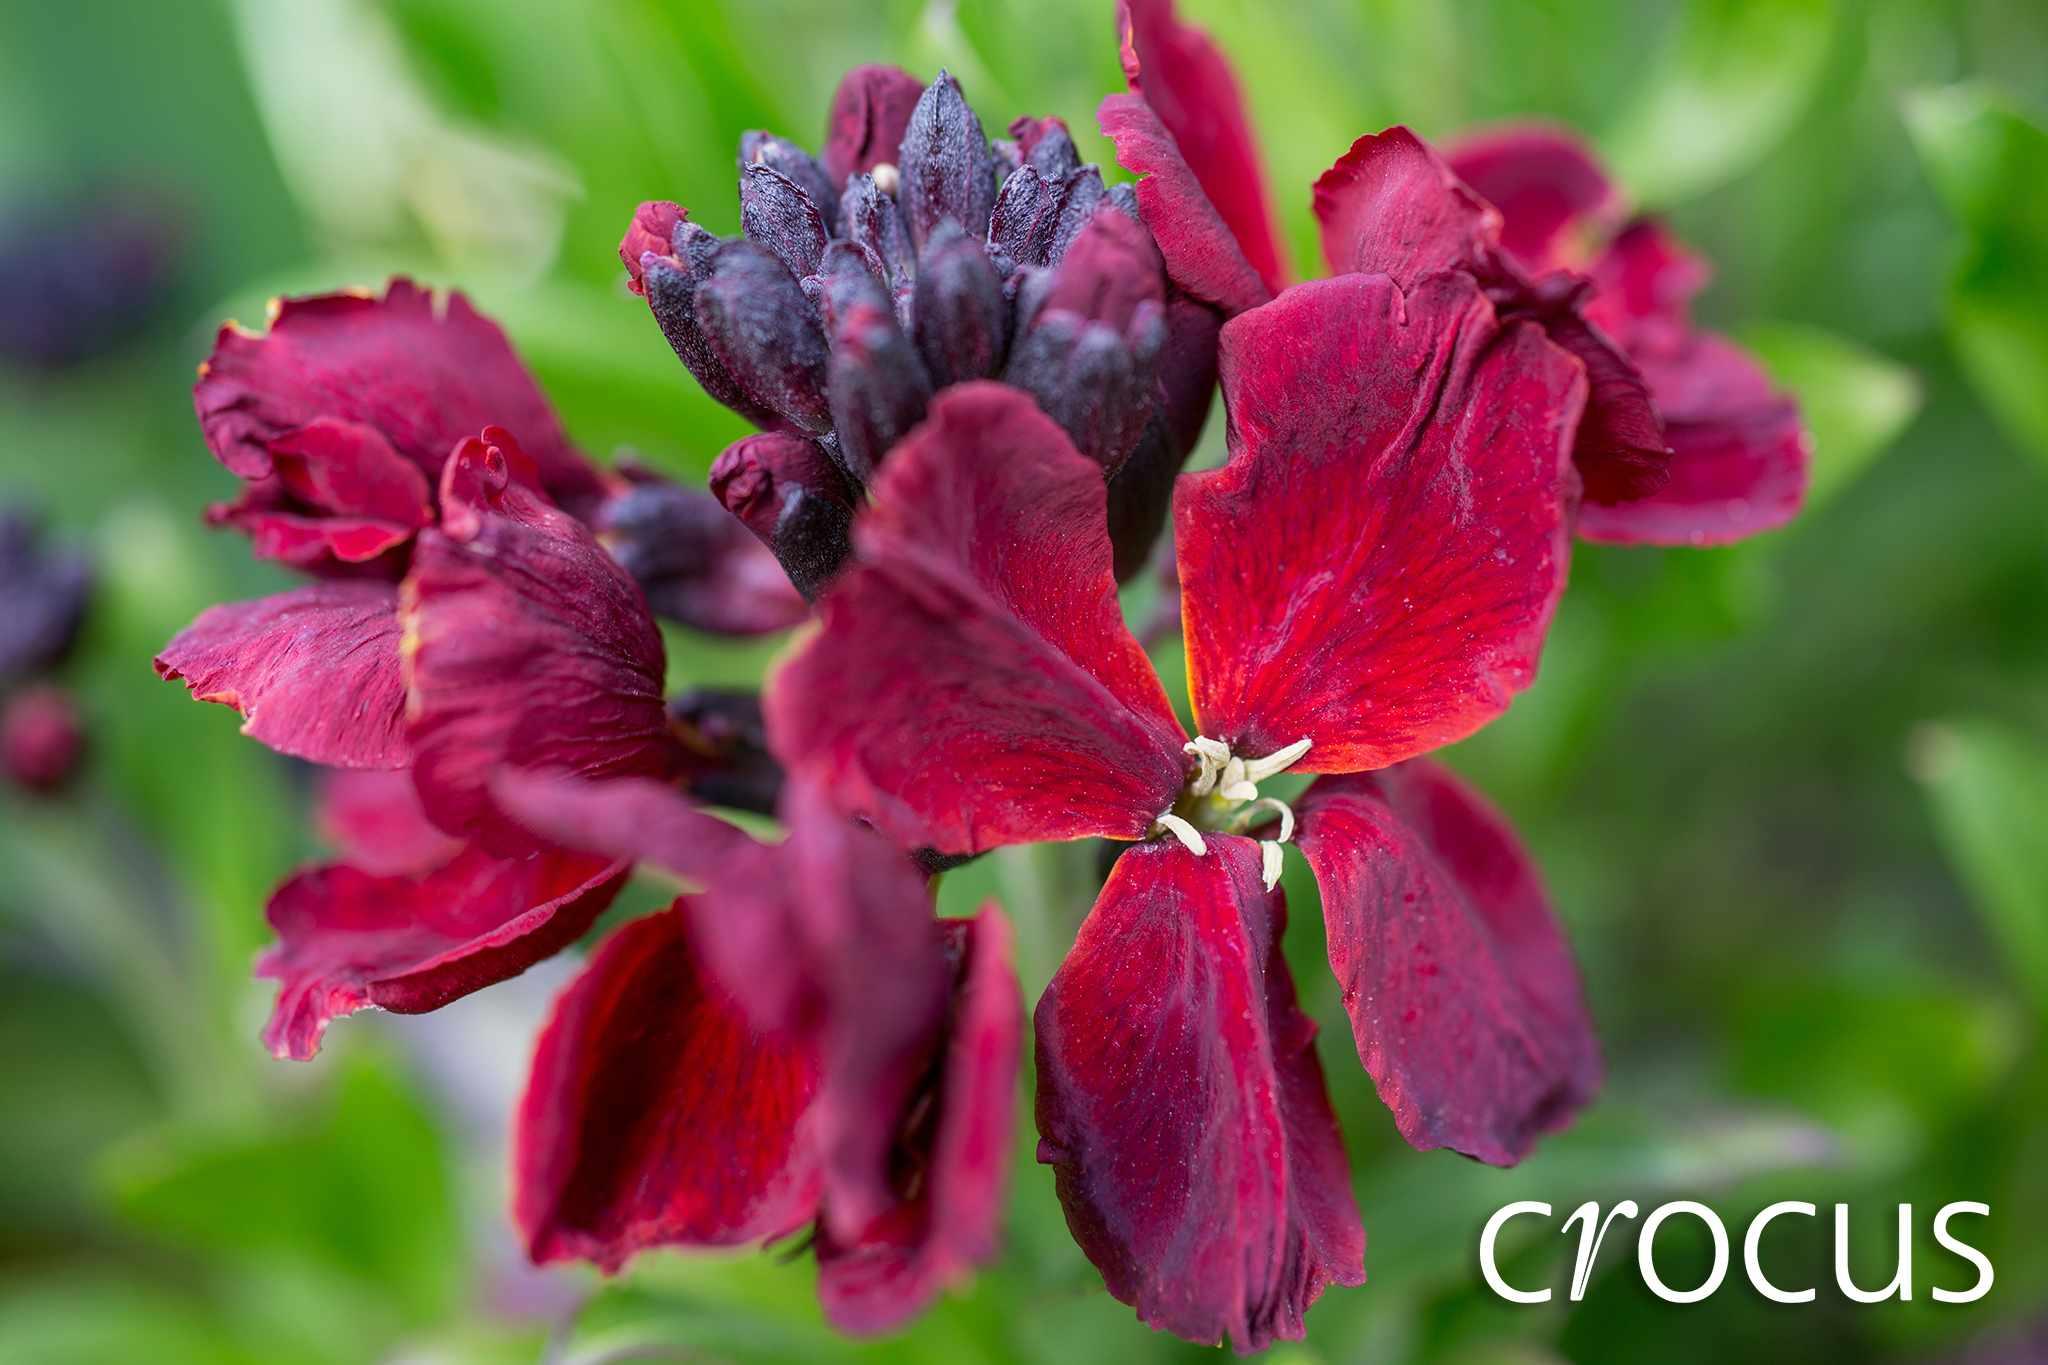 crocus-20-per-cent-wallflower-hero-2048-1365